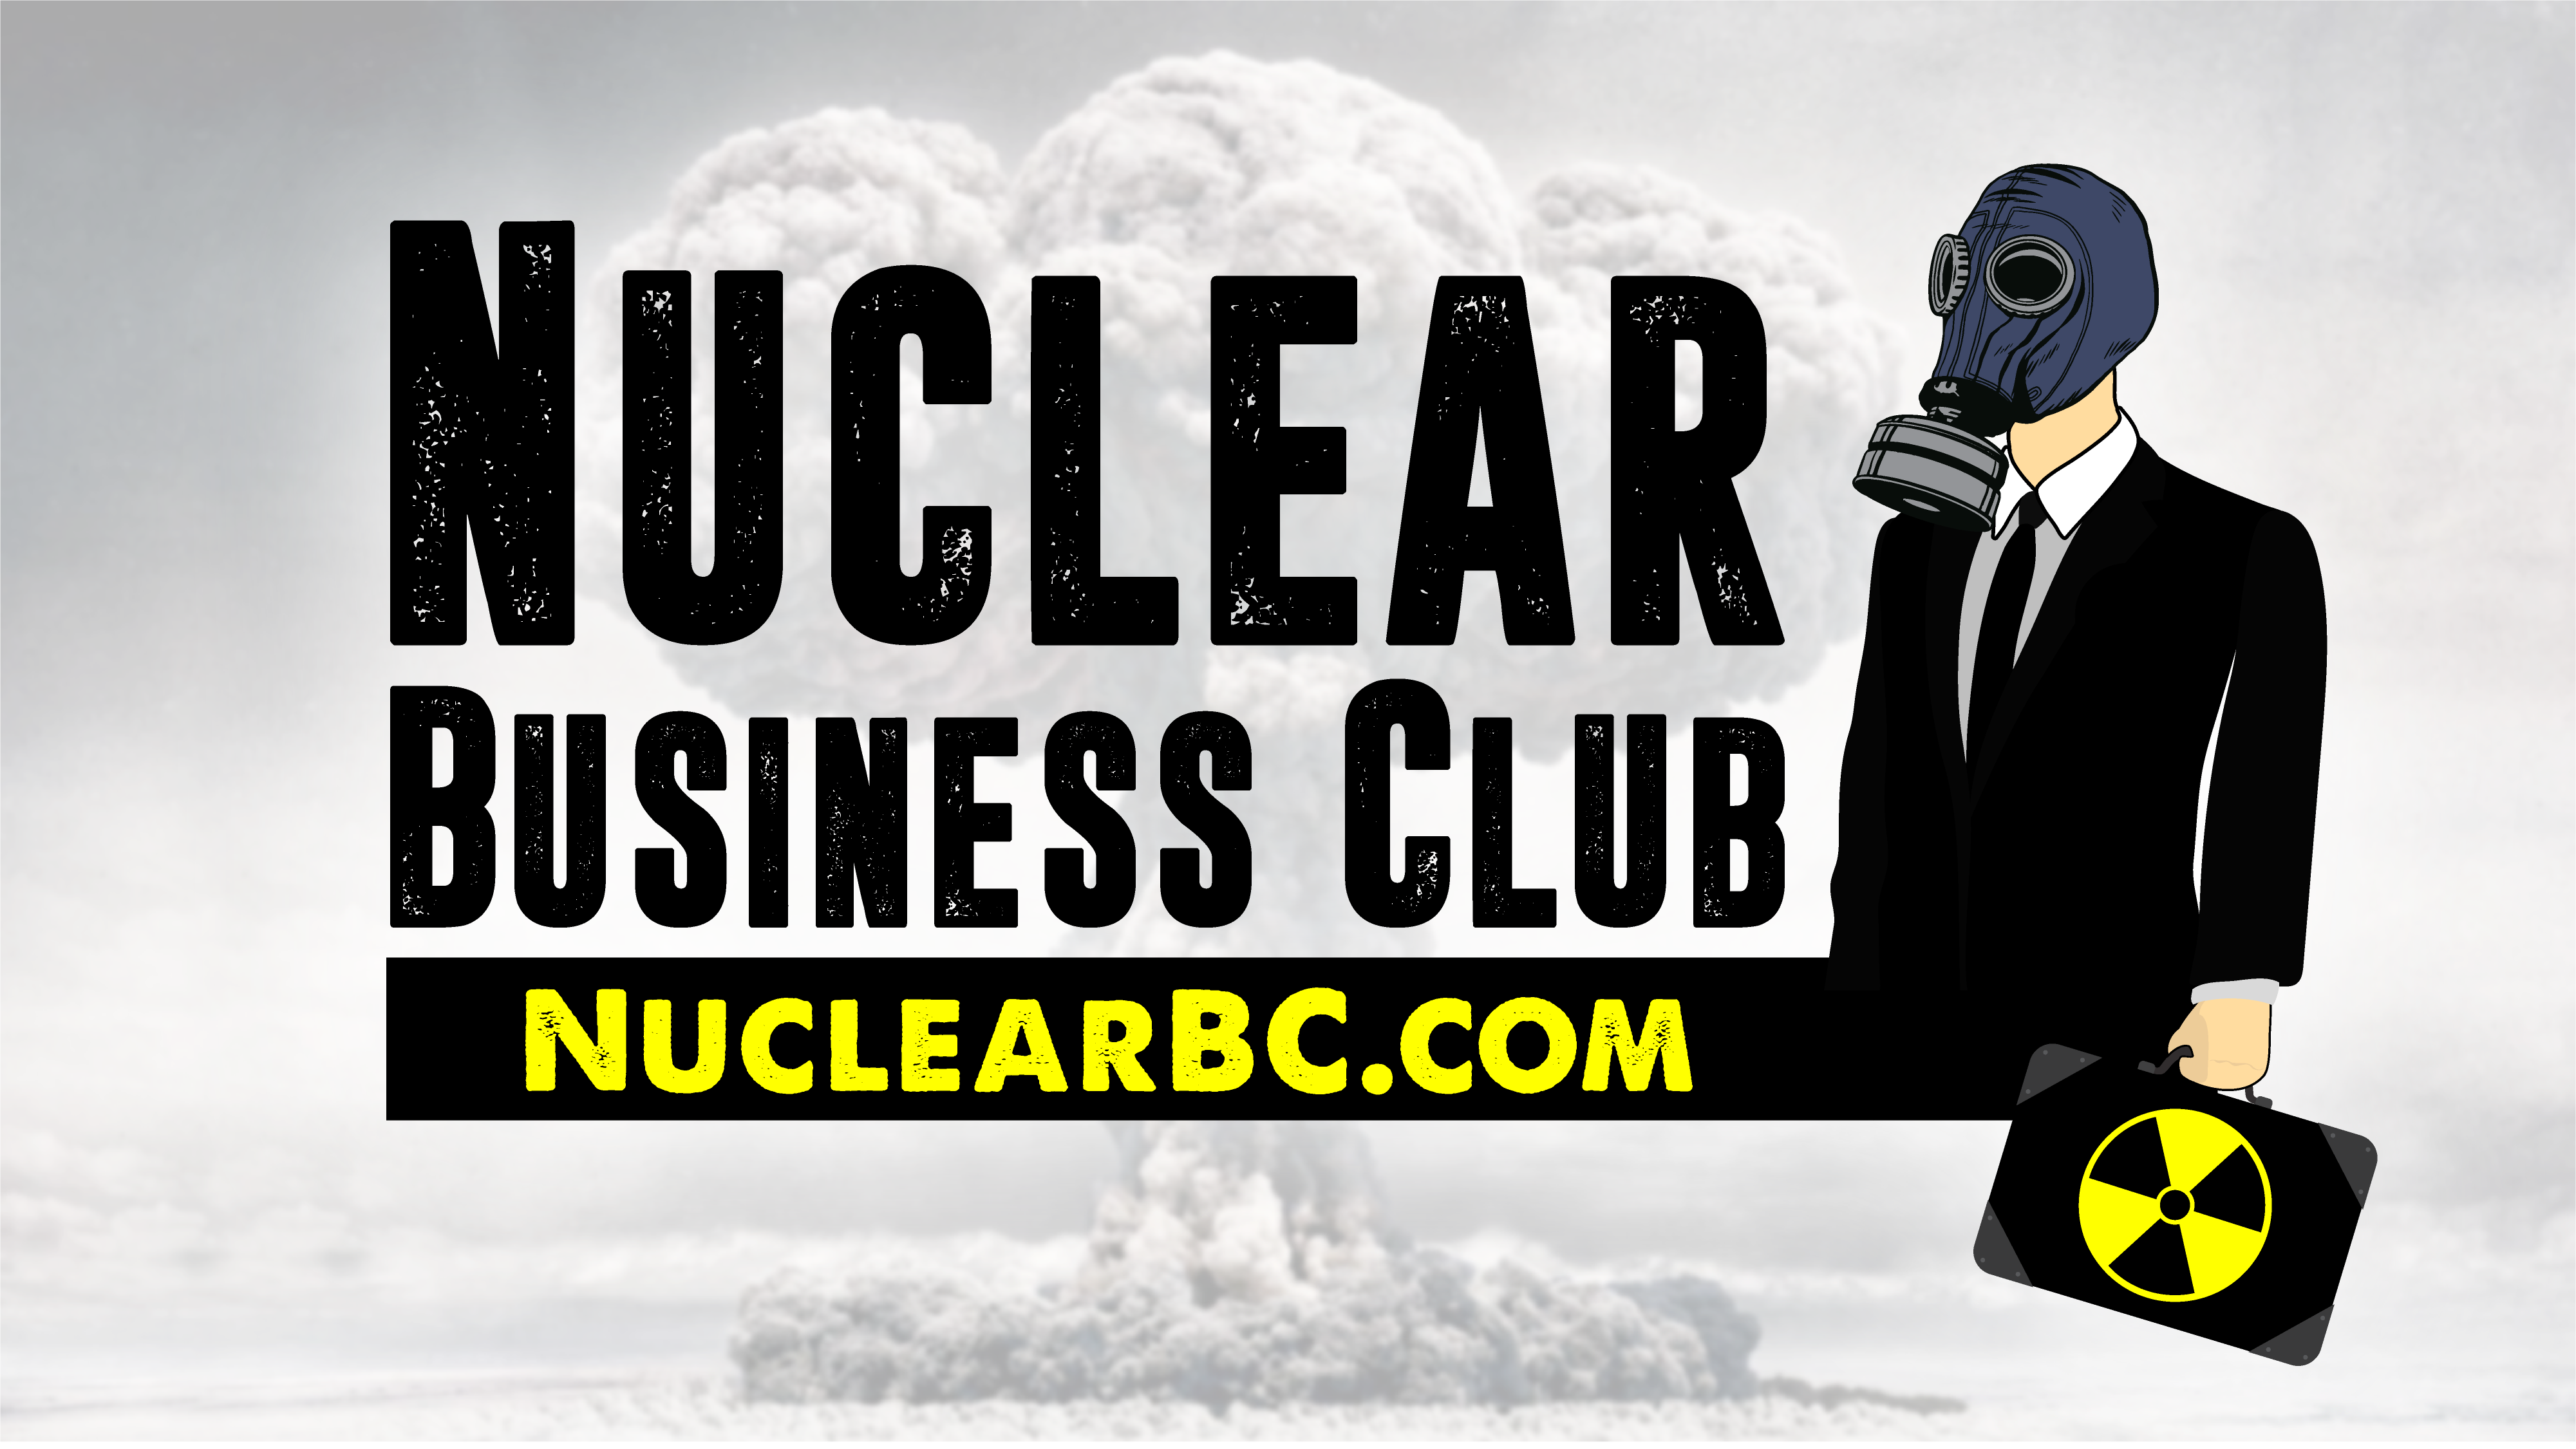 Nuclear Business Club Logo